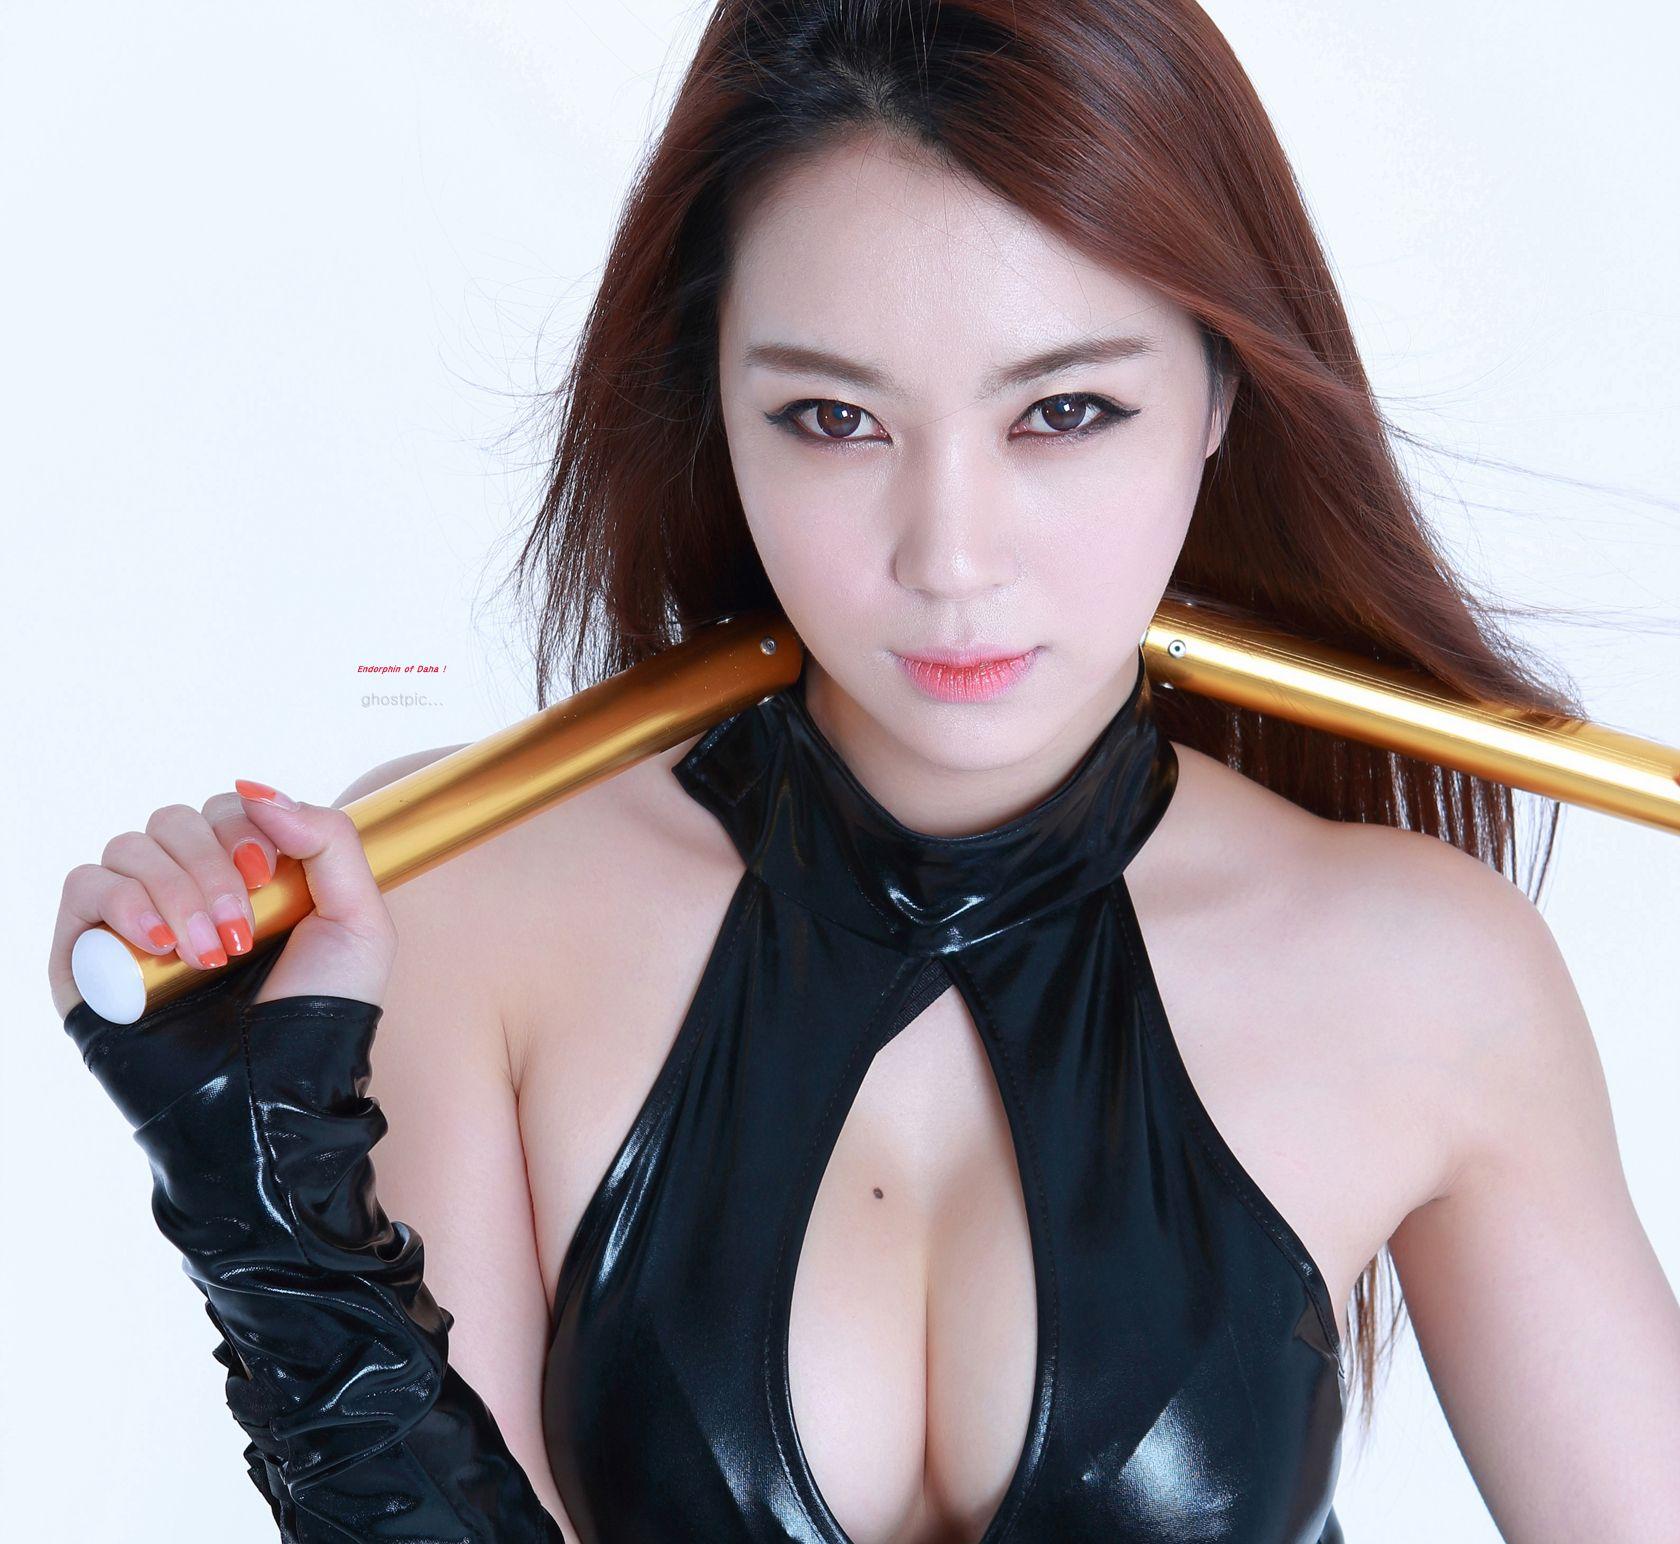 Kick-ass ninja cosplay by Joo Daha (one of the top racing models in Korea)